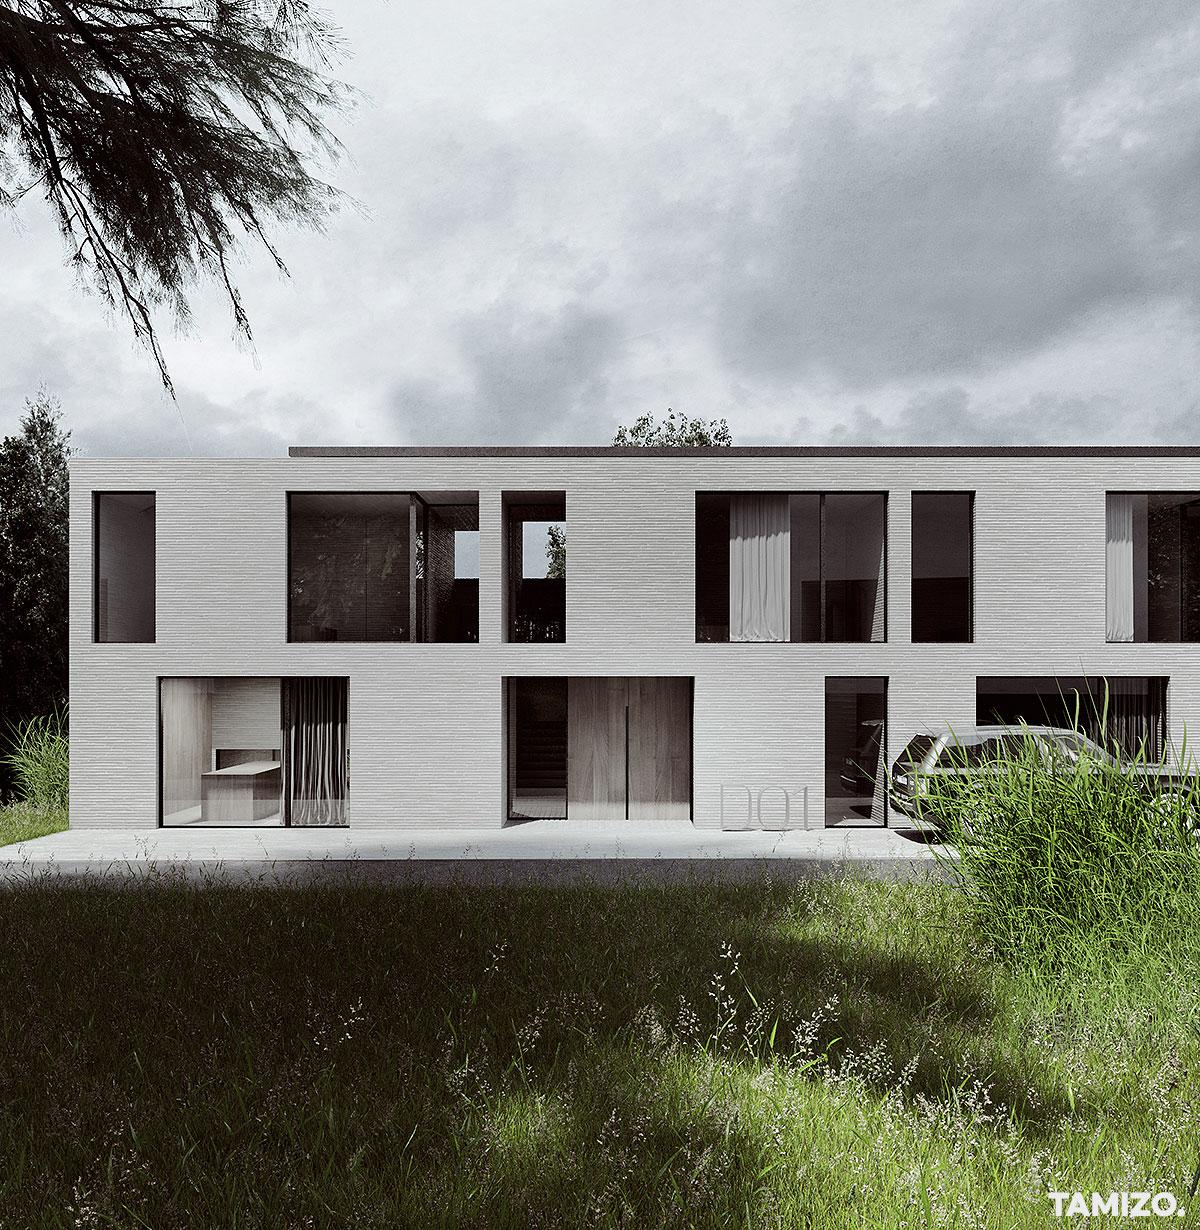 A061_tamizo_architects_competition_tbilisi_georgia_multifamily_houseing_realestate_15